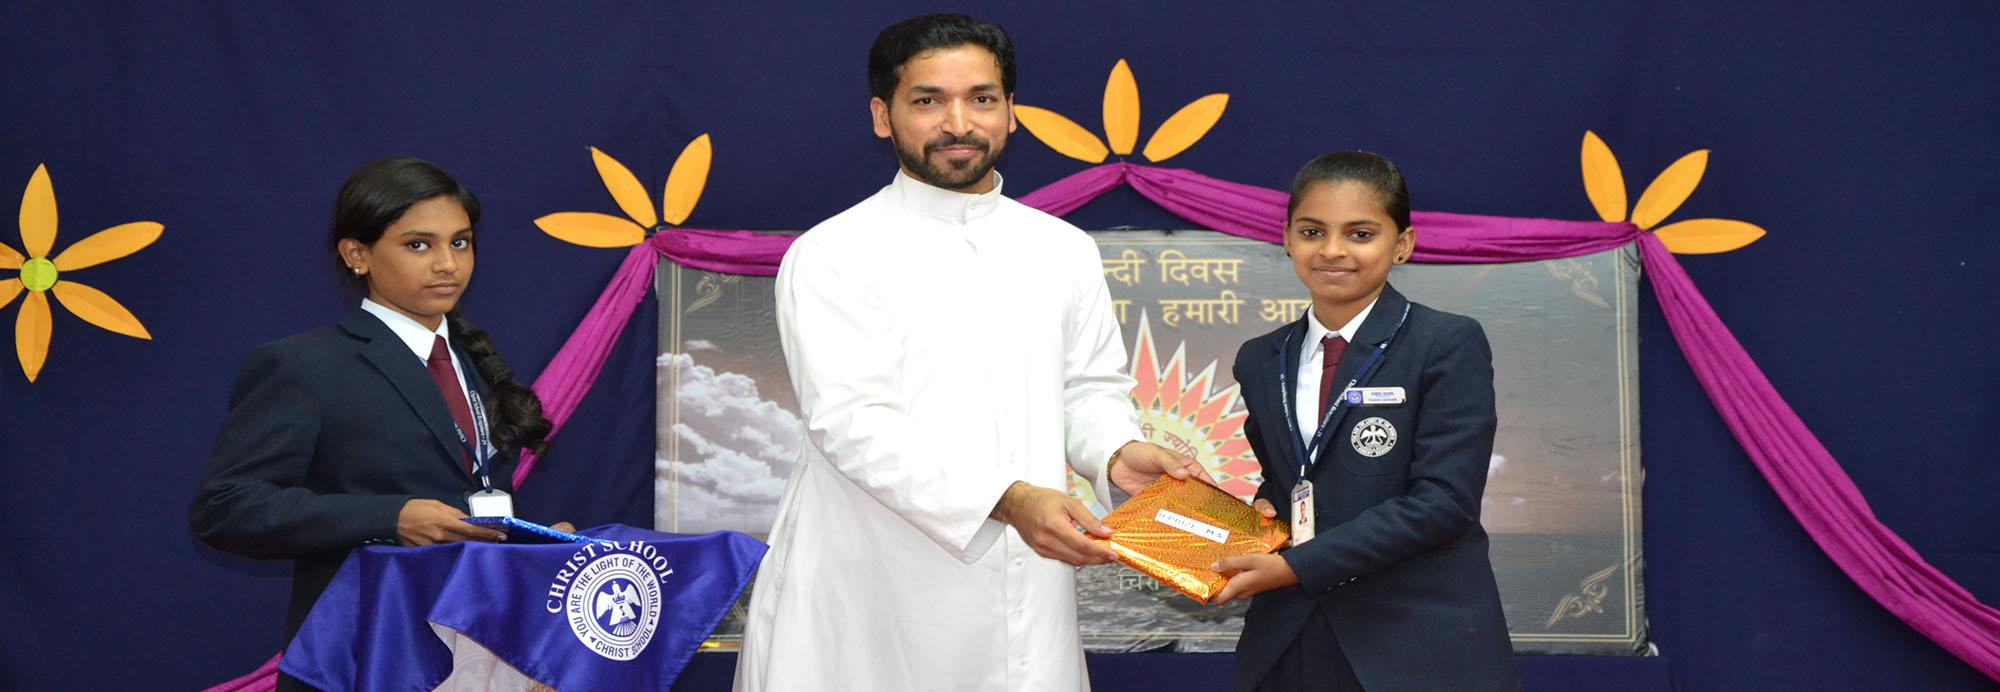 Christ school organized  Hindi Diwas on  14-09-17